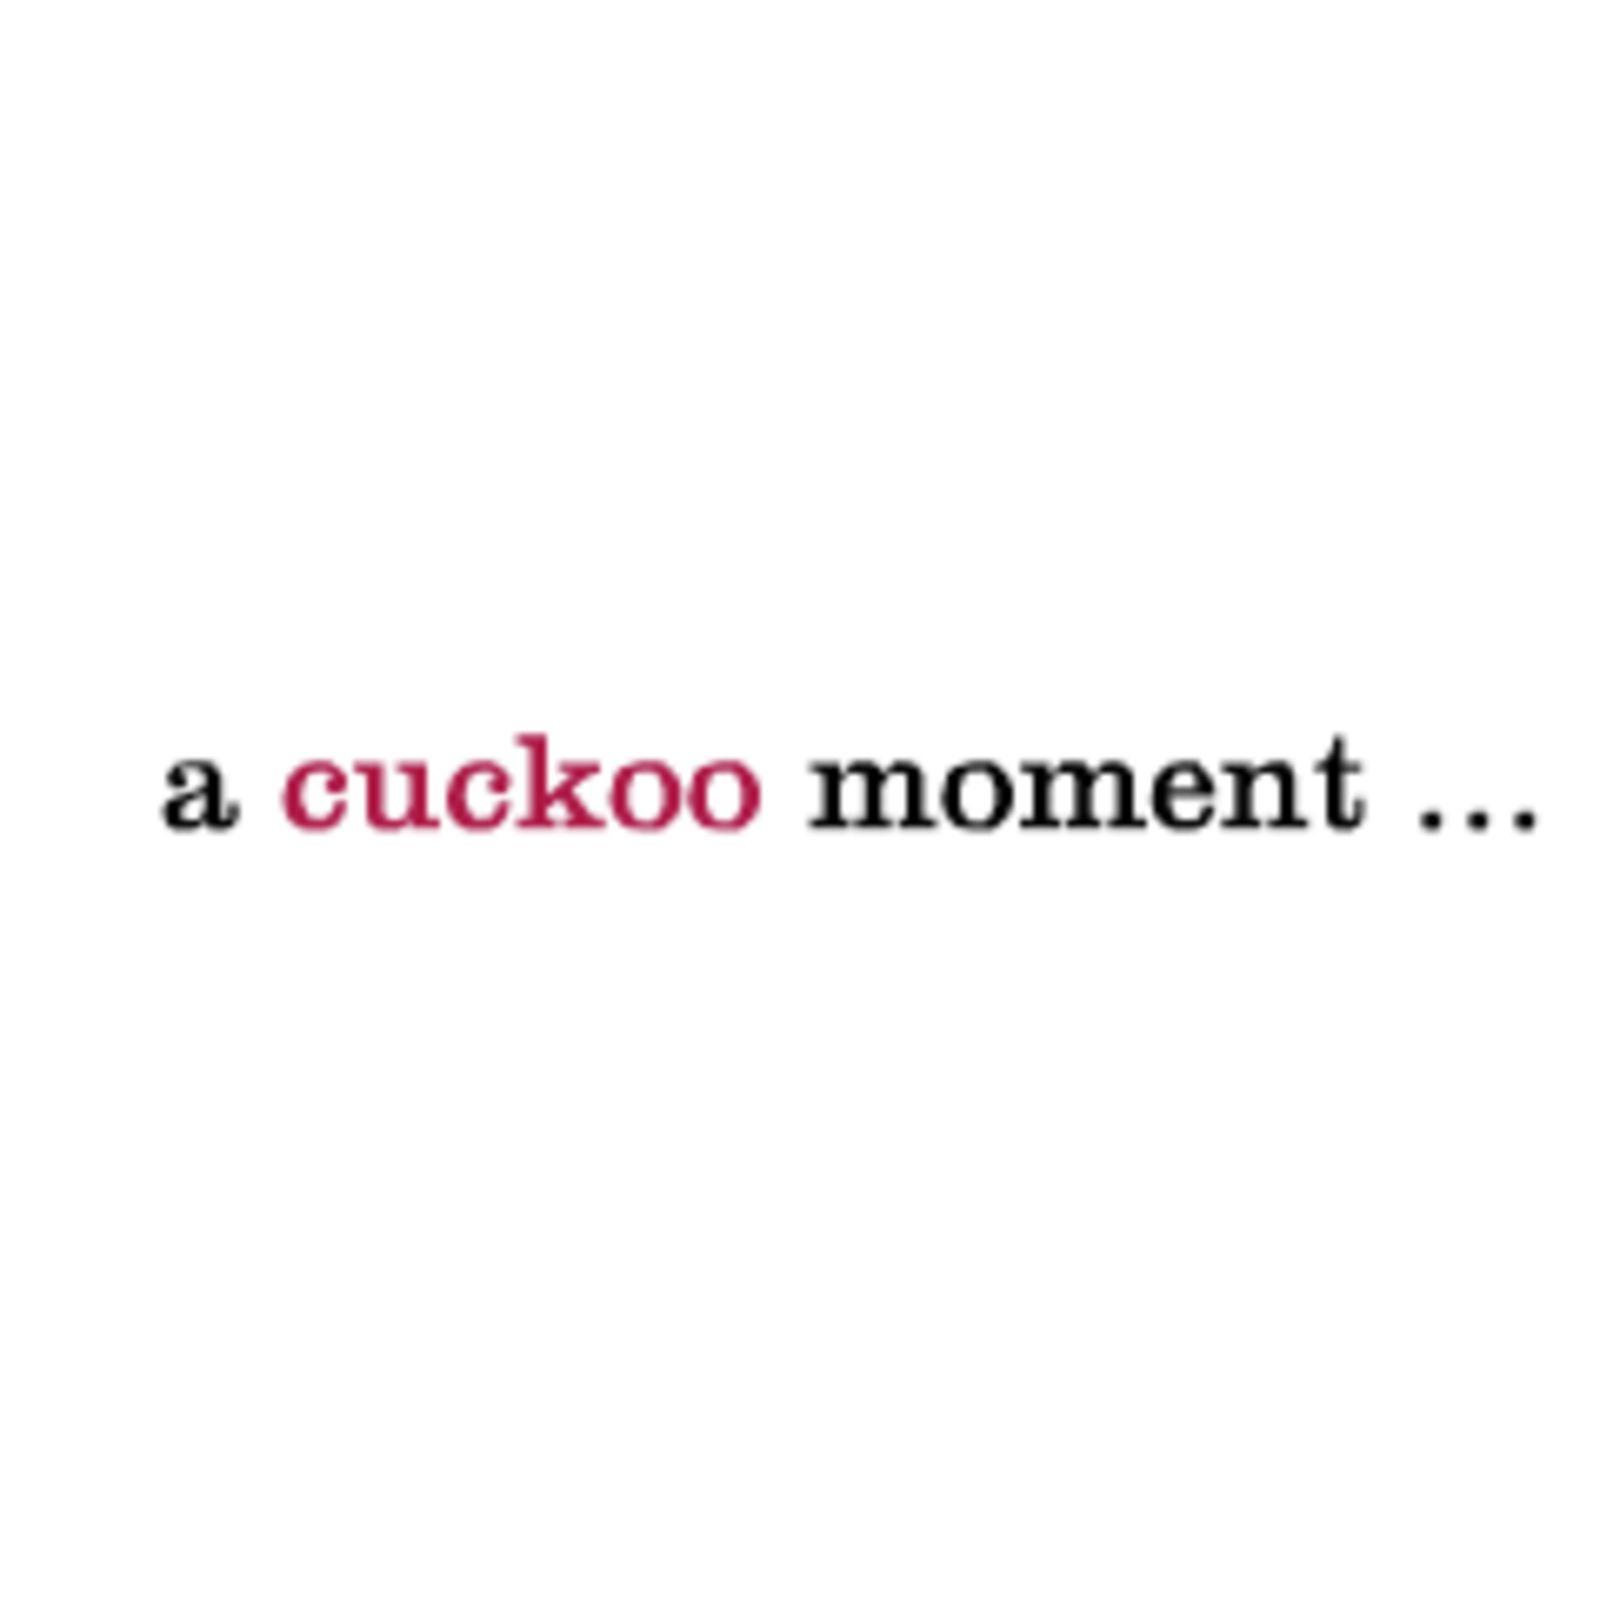 a cuckoo moment (Bild 1)